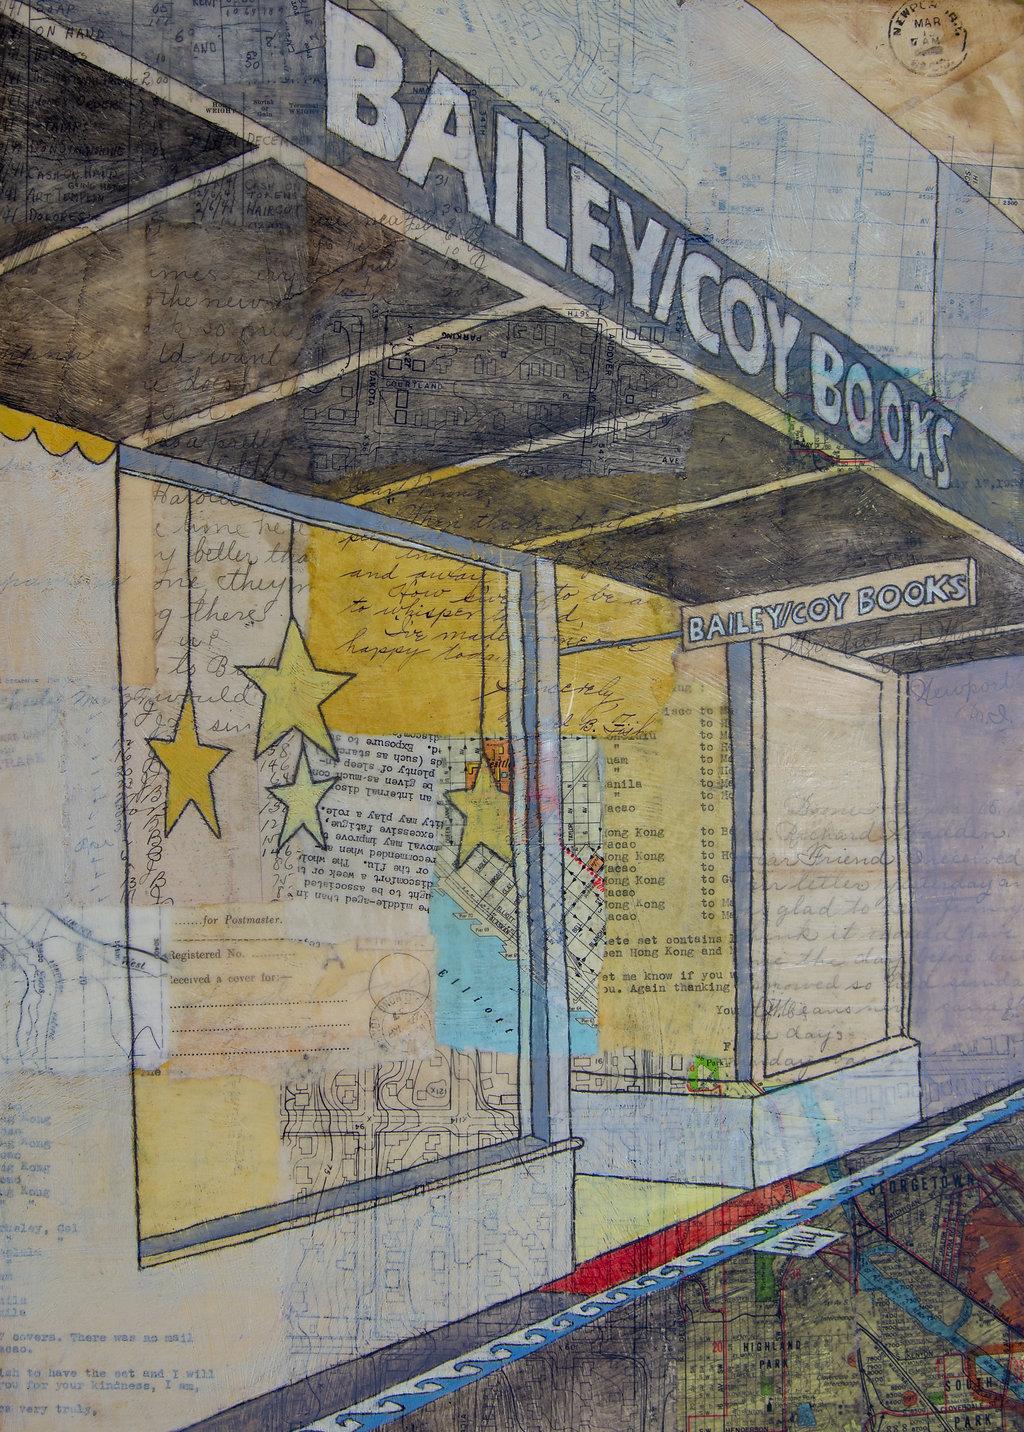 Bailey/Coy Books